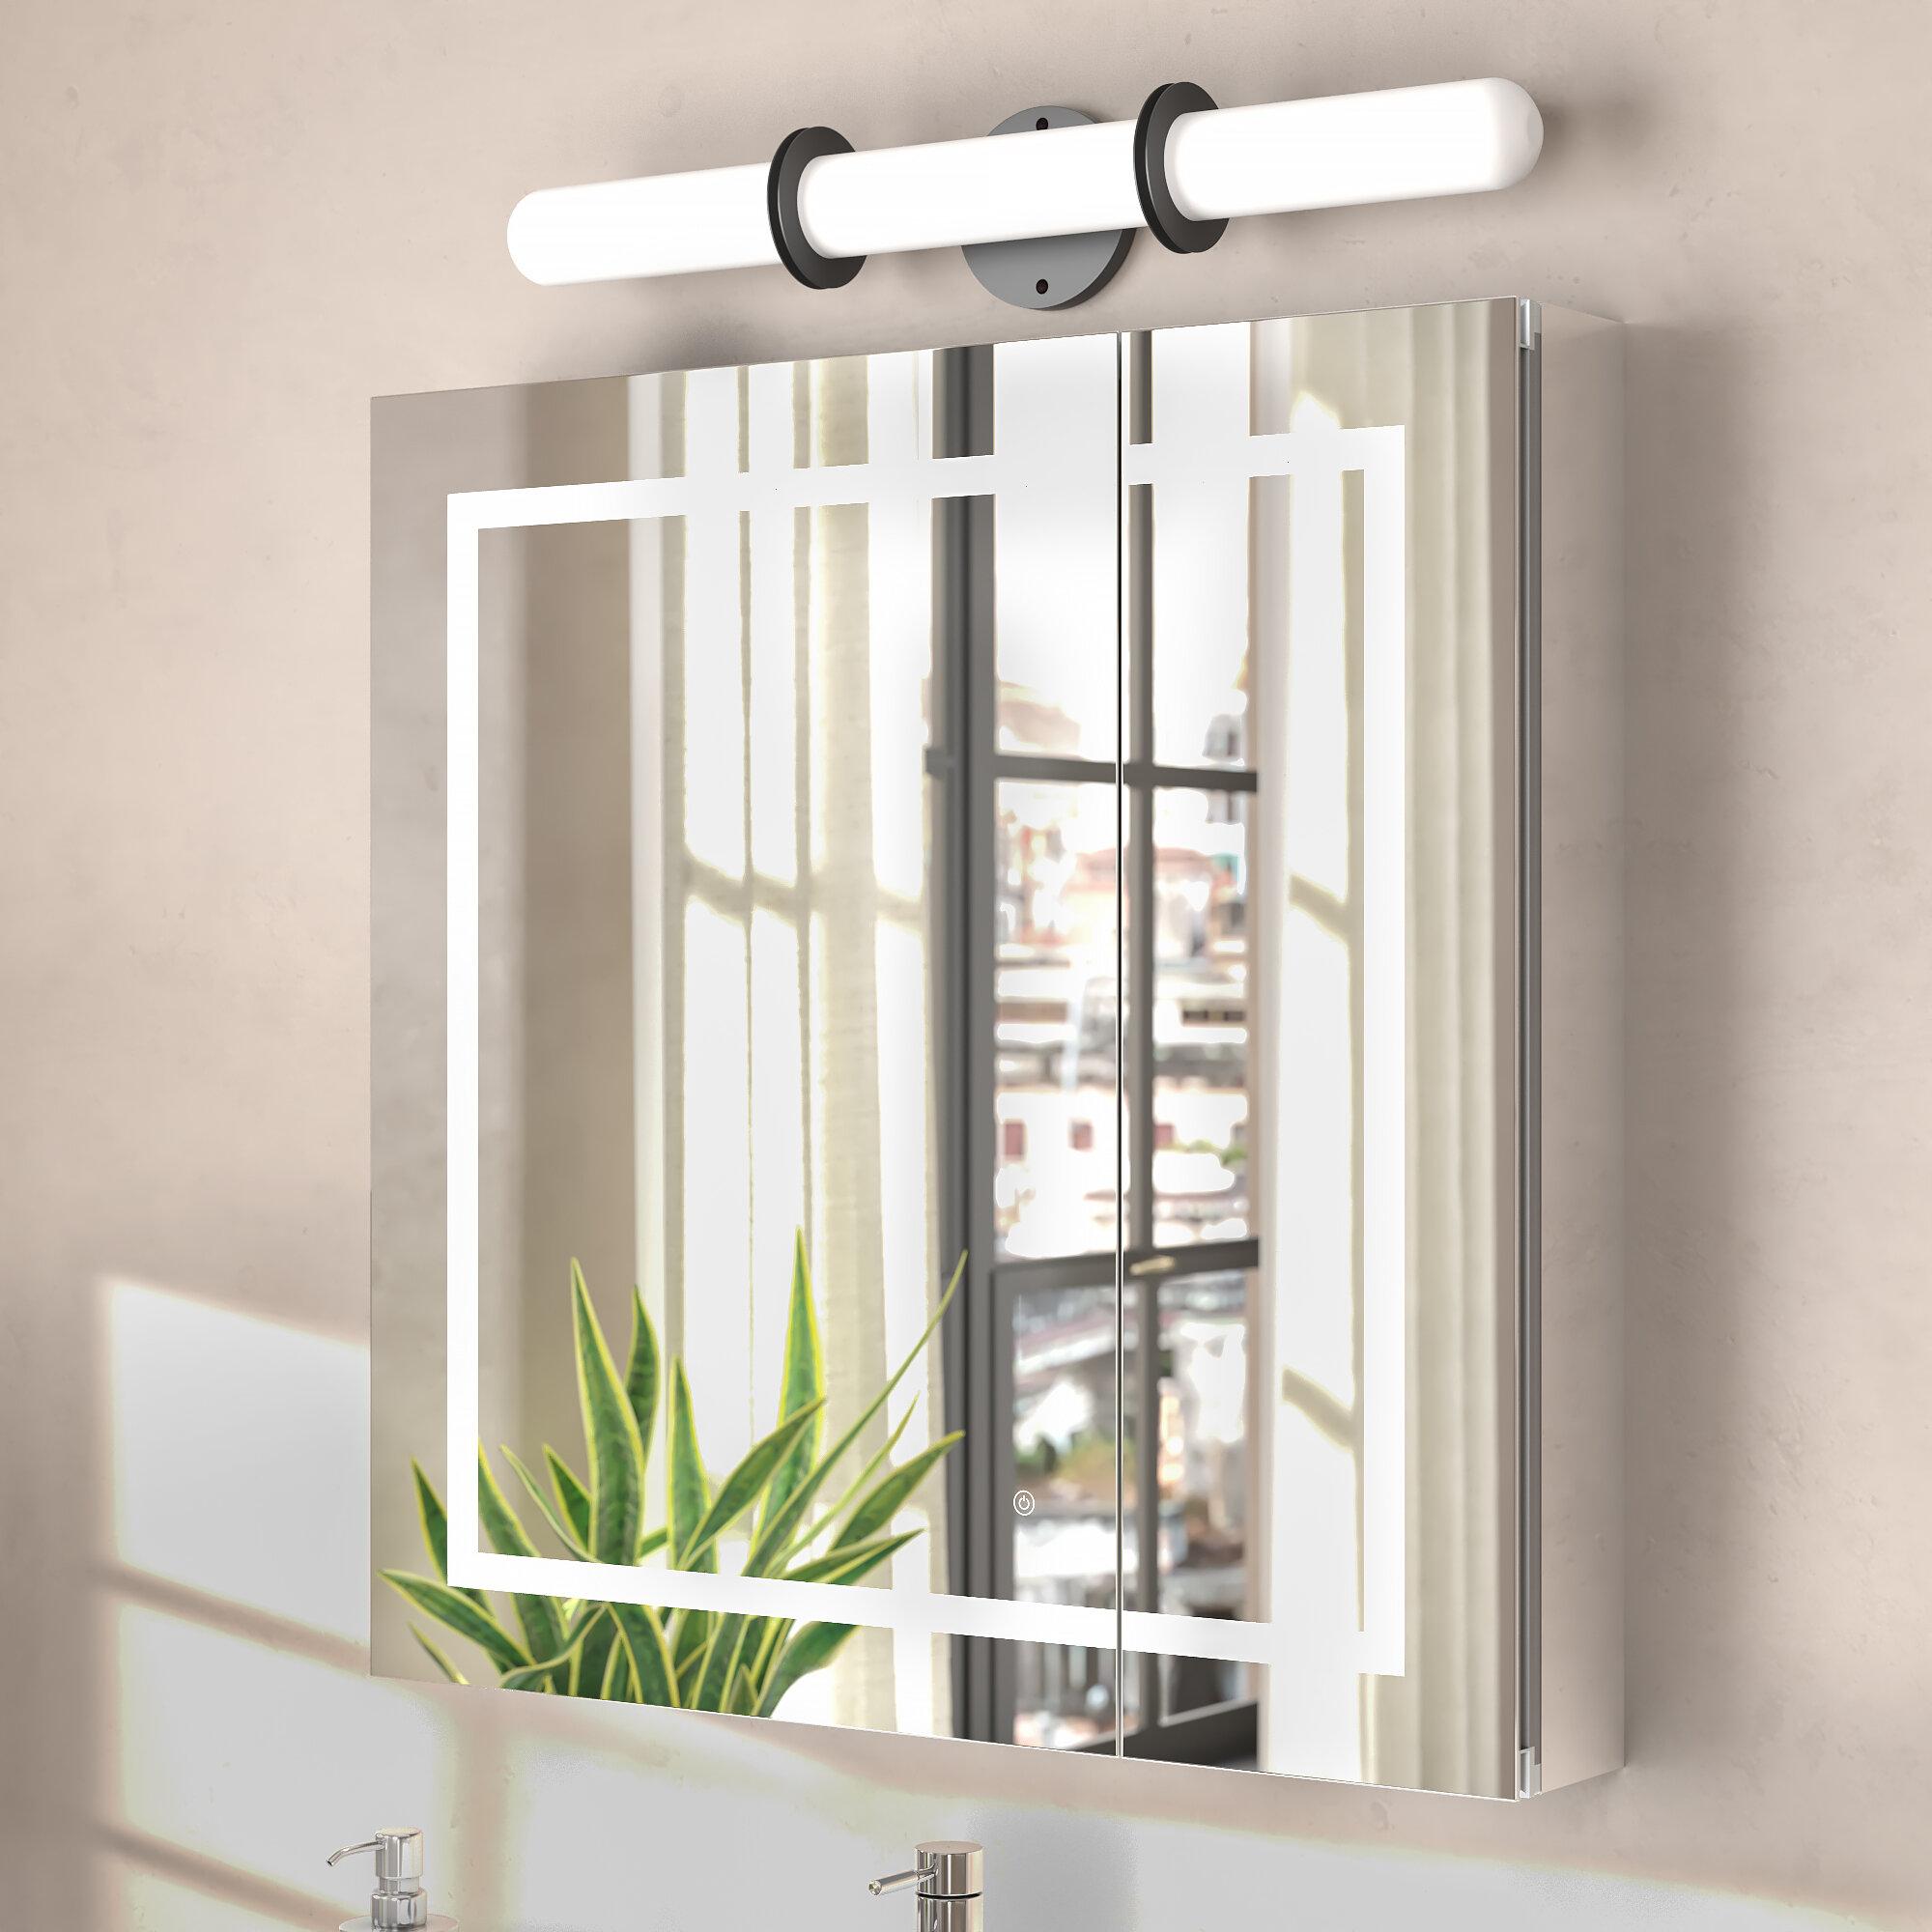 Wayfair Led Lighting Medicine Cabinets You Ll Love In 2021